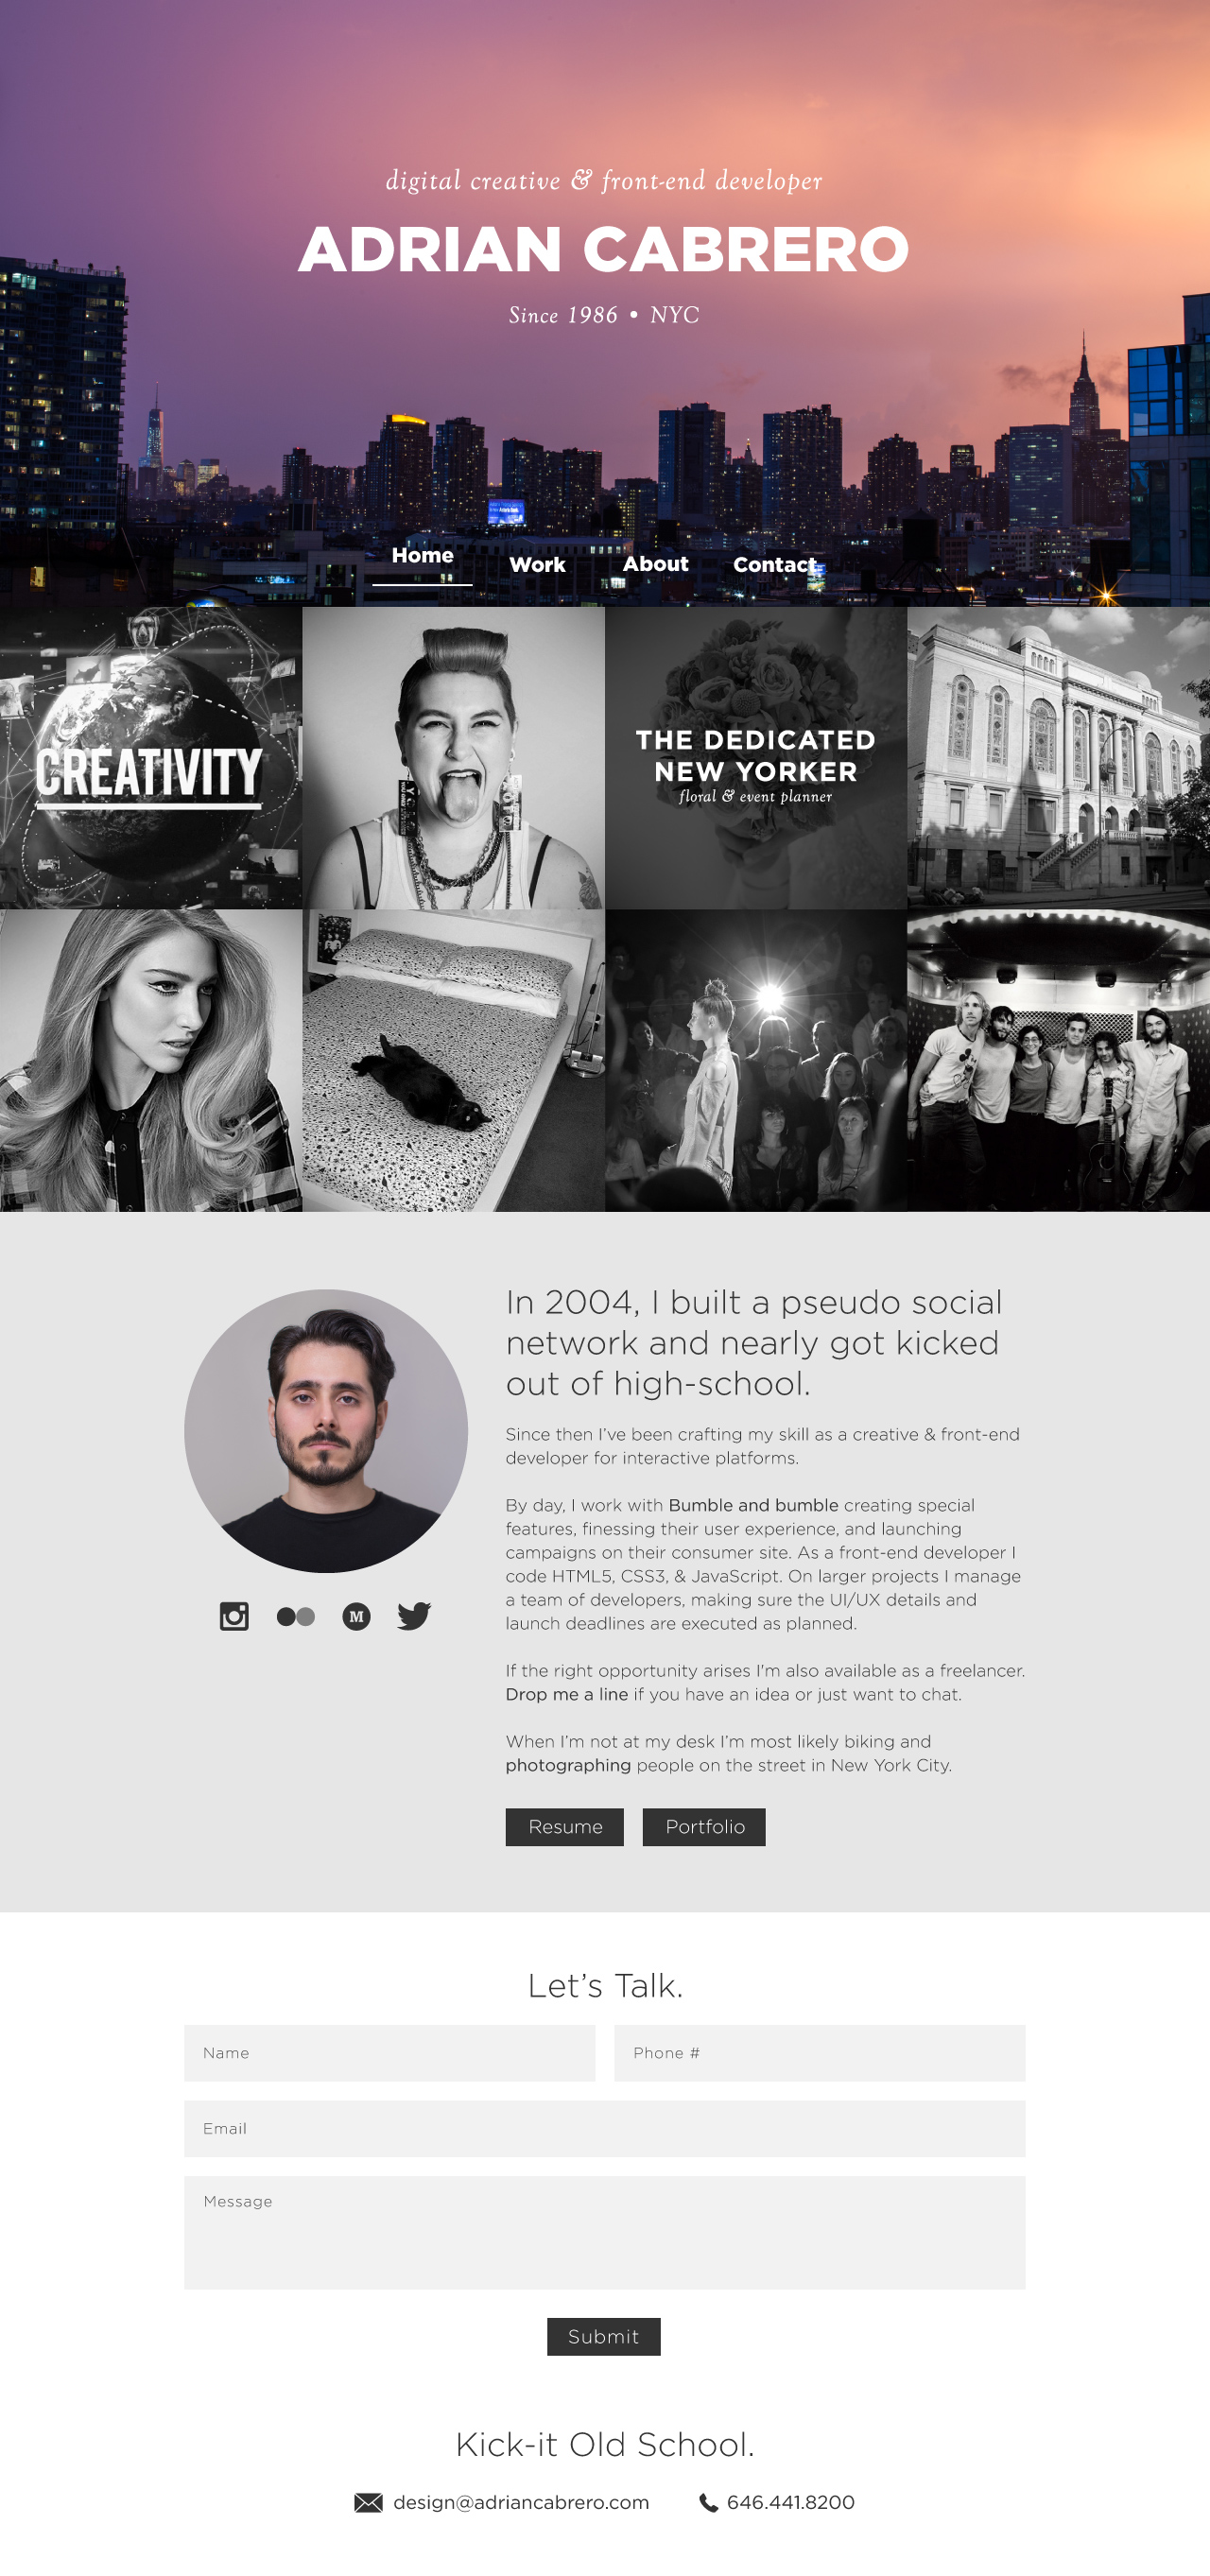 Adrian Cabrero Website Screenshot